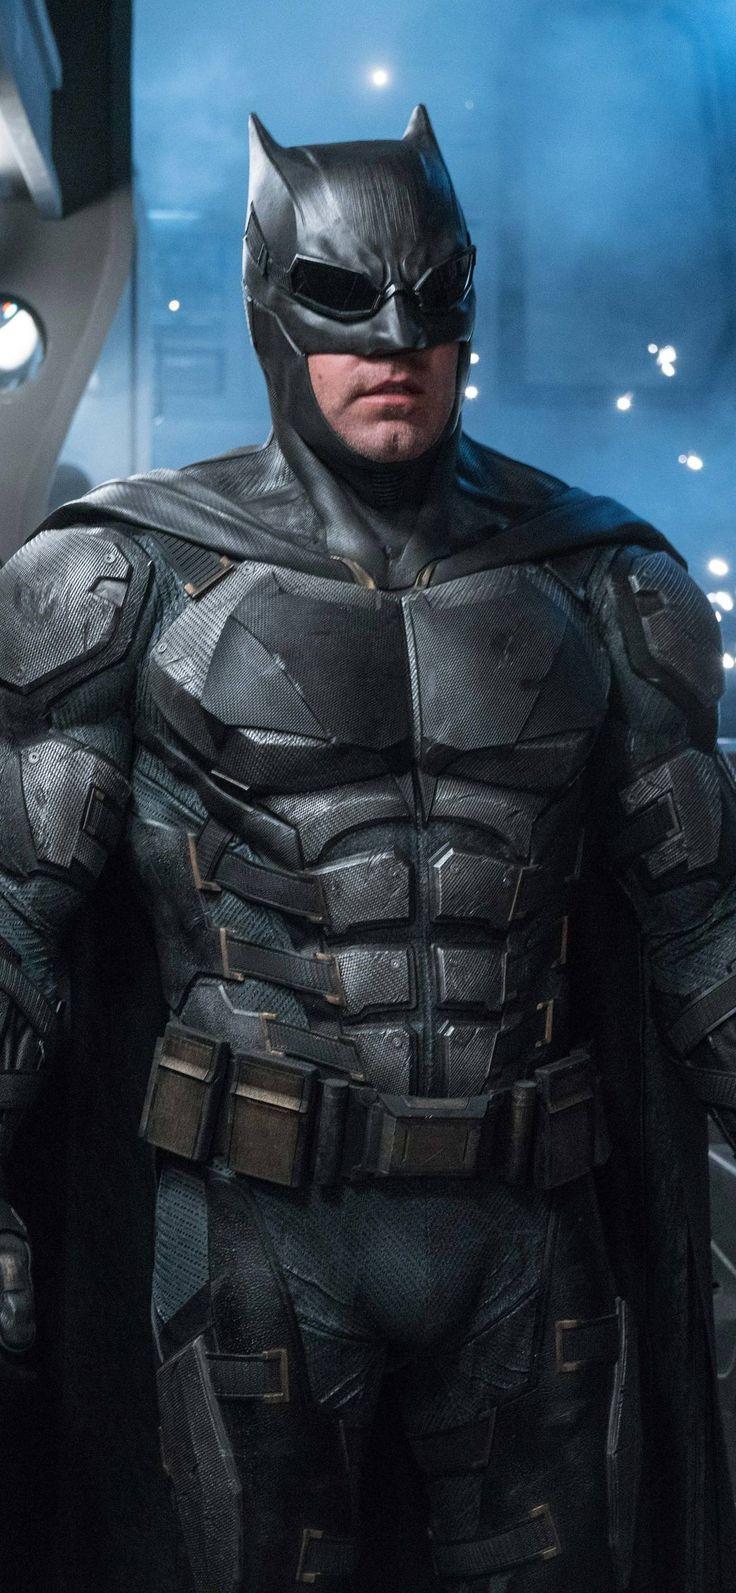 1125x2436 Ben Affleck As Batman In Justice League 8k